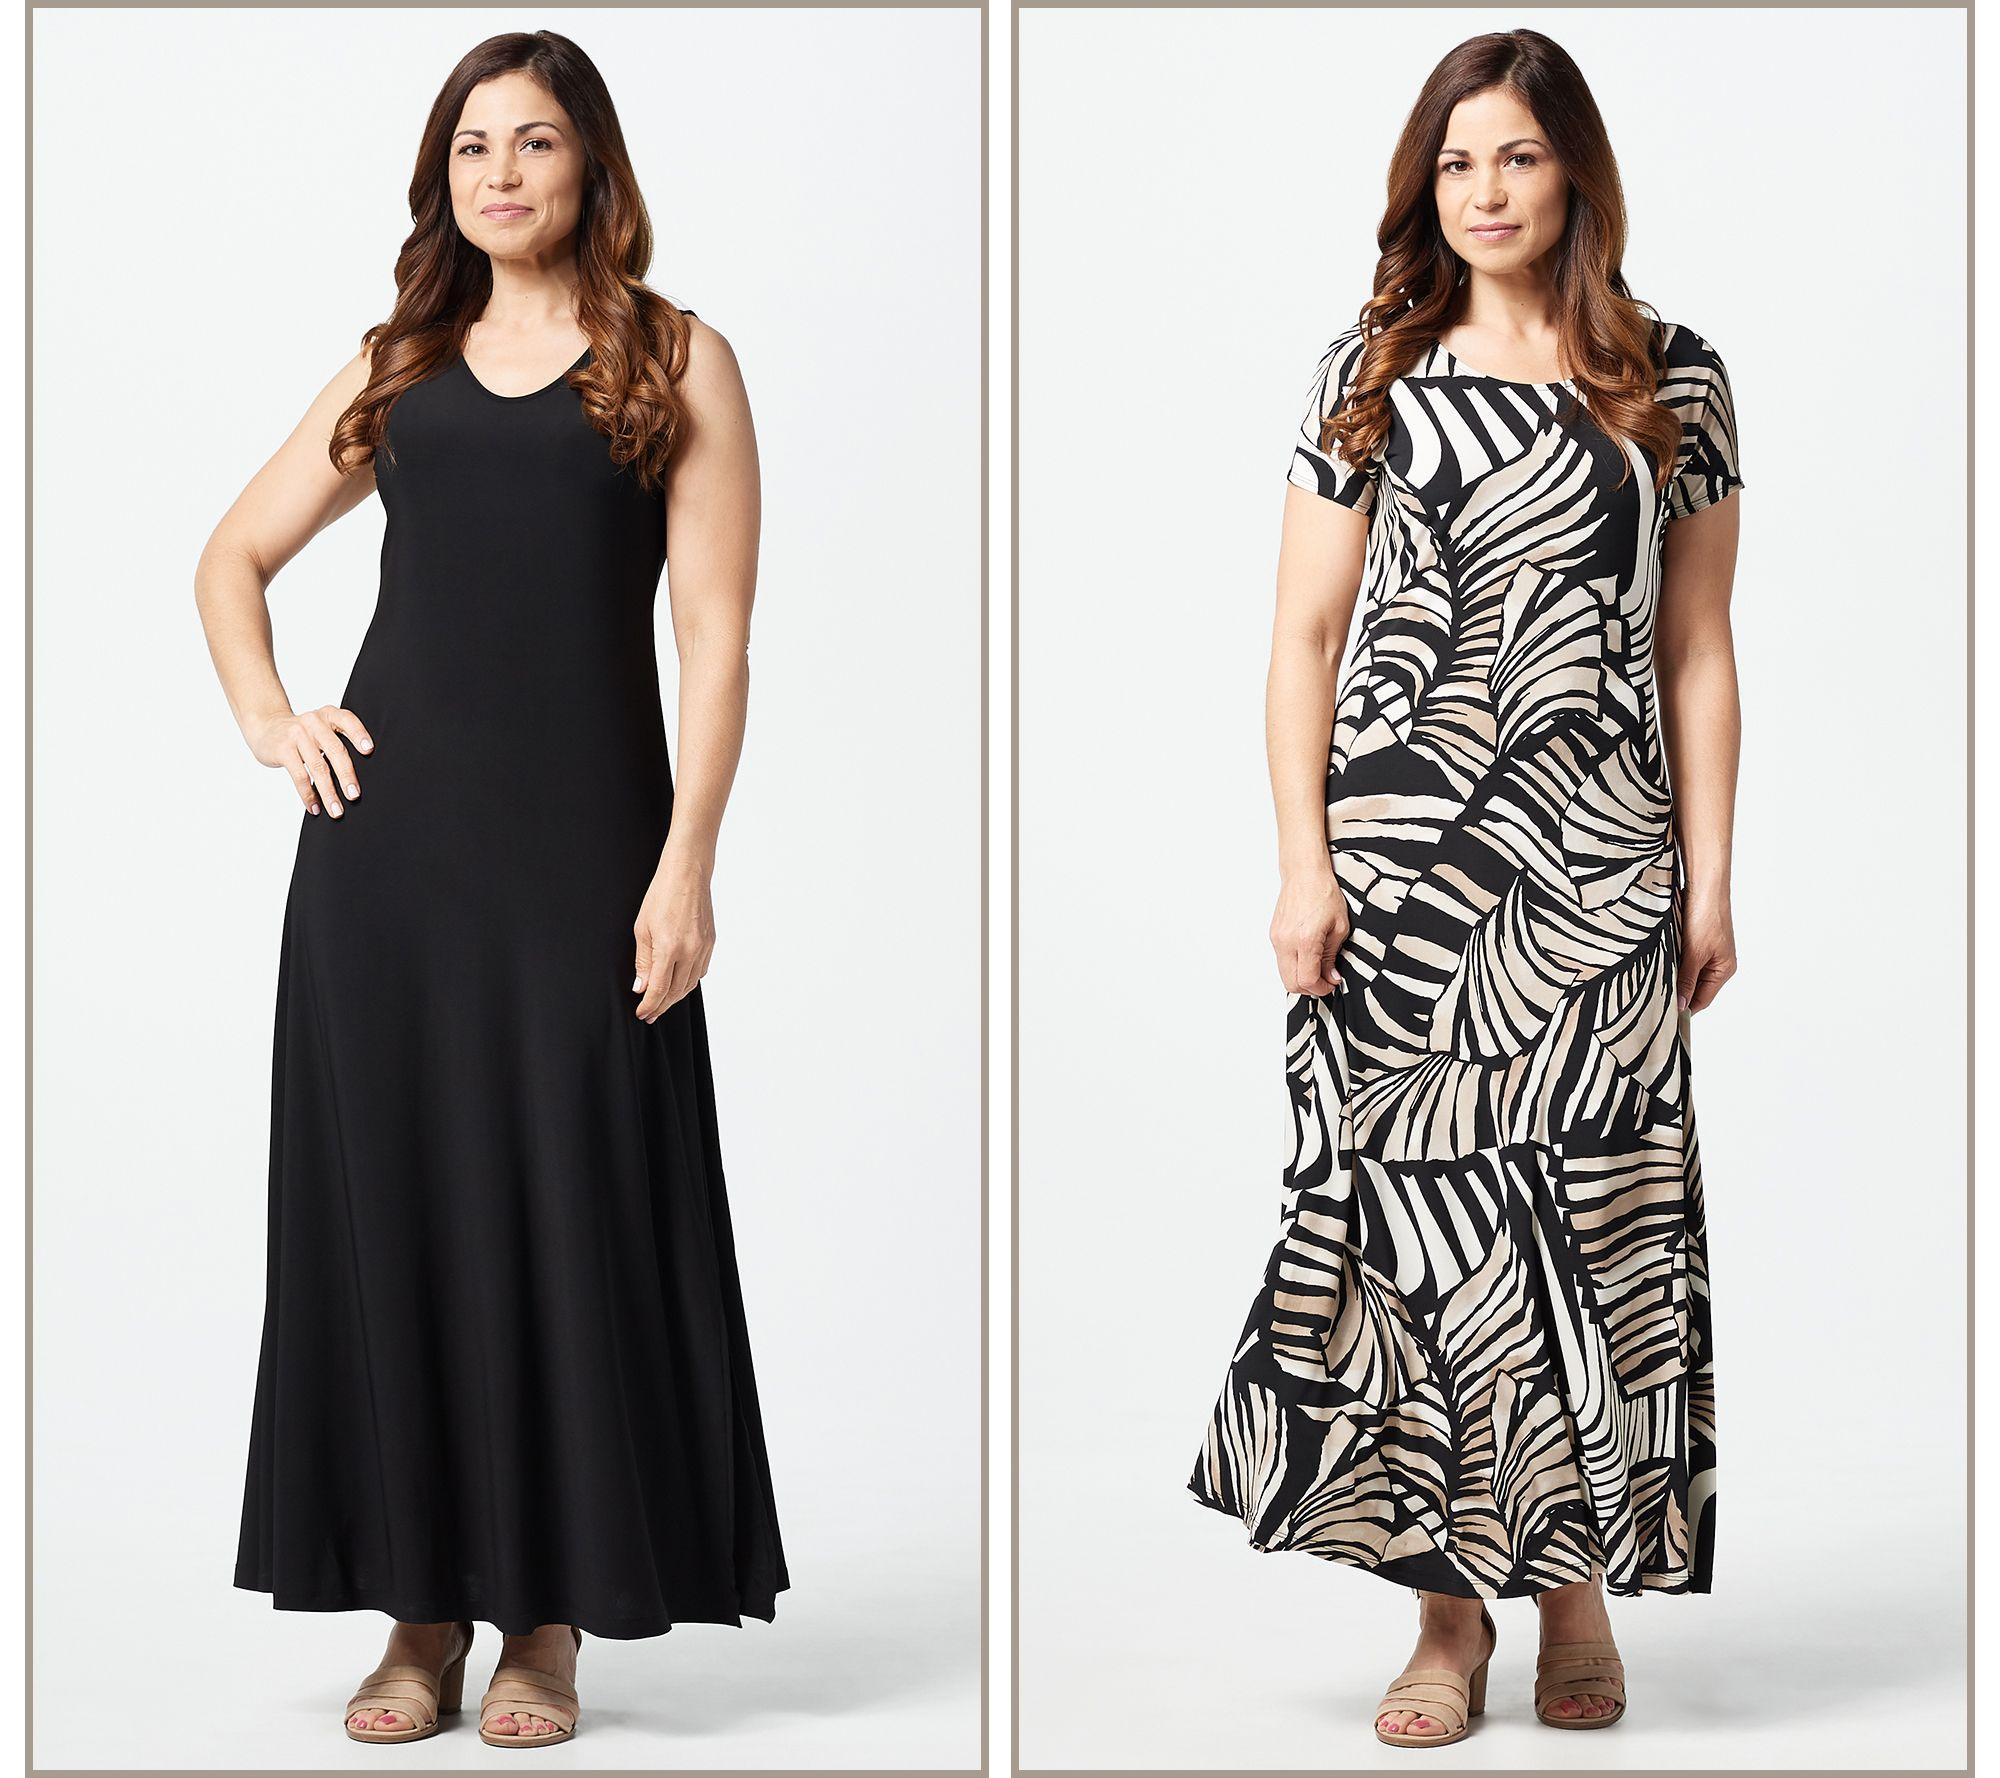 17b479c7088c Attitudes by Renee Petite Como Jersey Set of 2 Maxi Dresses - Page 1 —  QVC.com